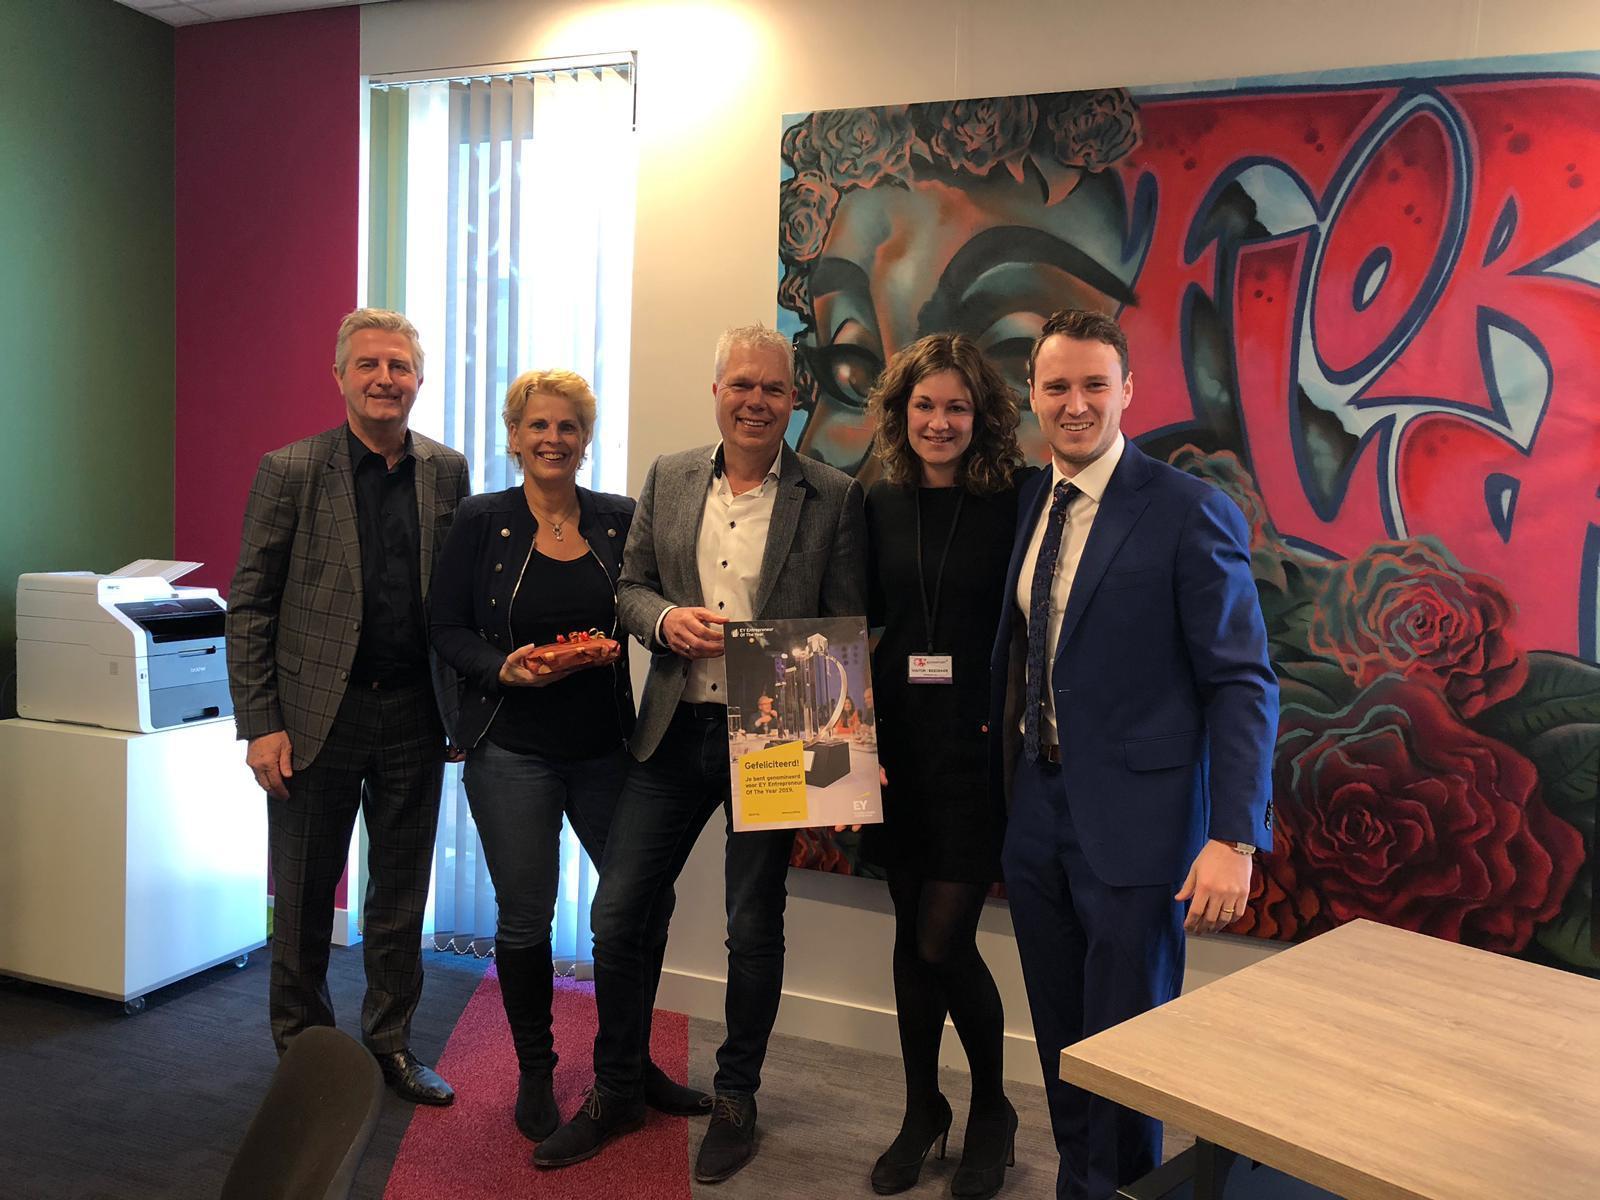 John Celie genomineerd voor EY Entrepreneur Of The Year 2019